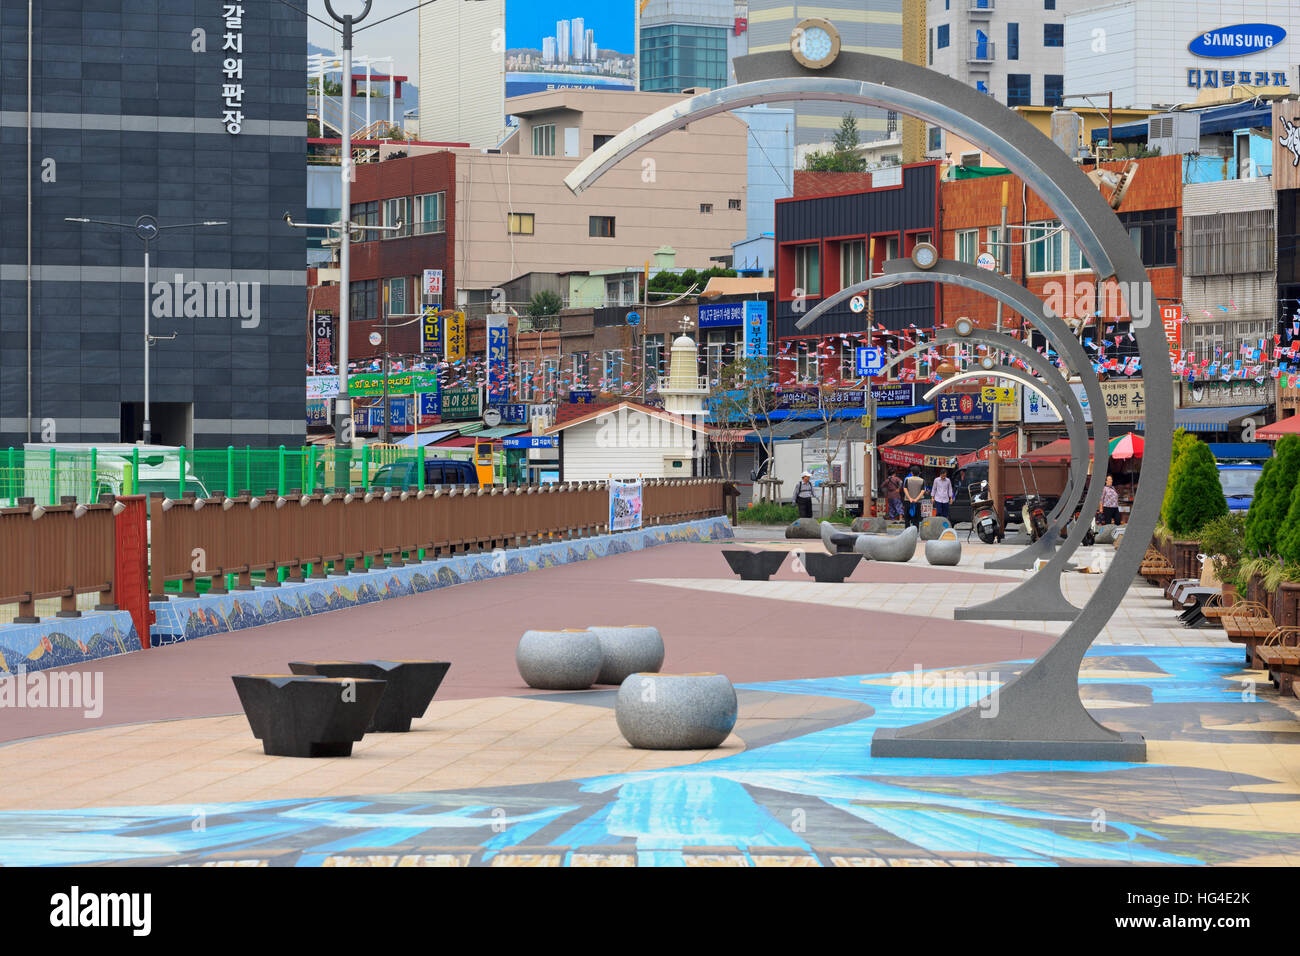 Waterfront Promenade, Nampo District, Busan, South Korea, Asia - Stock Image